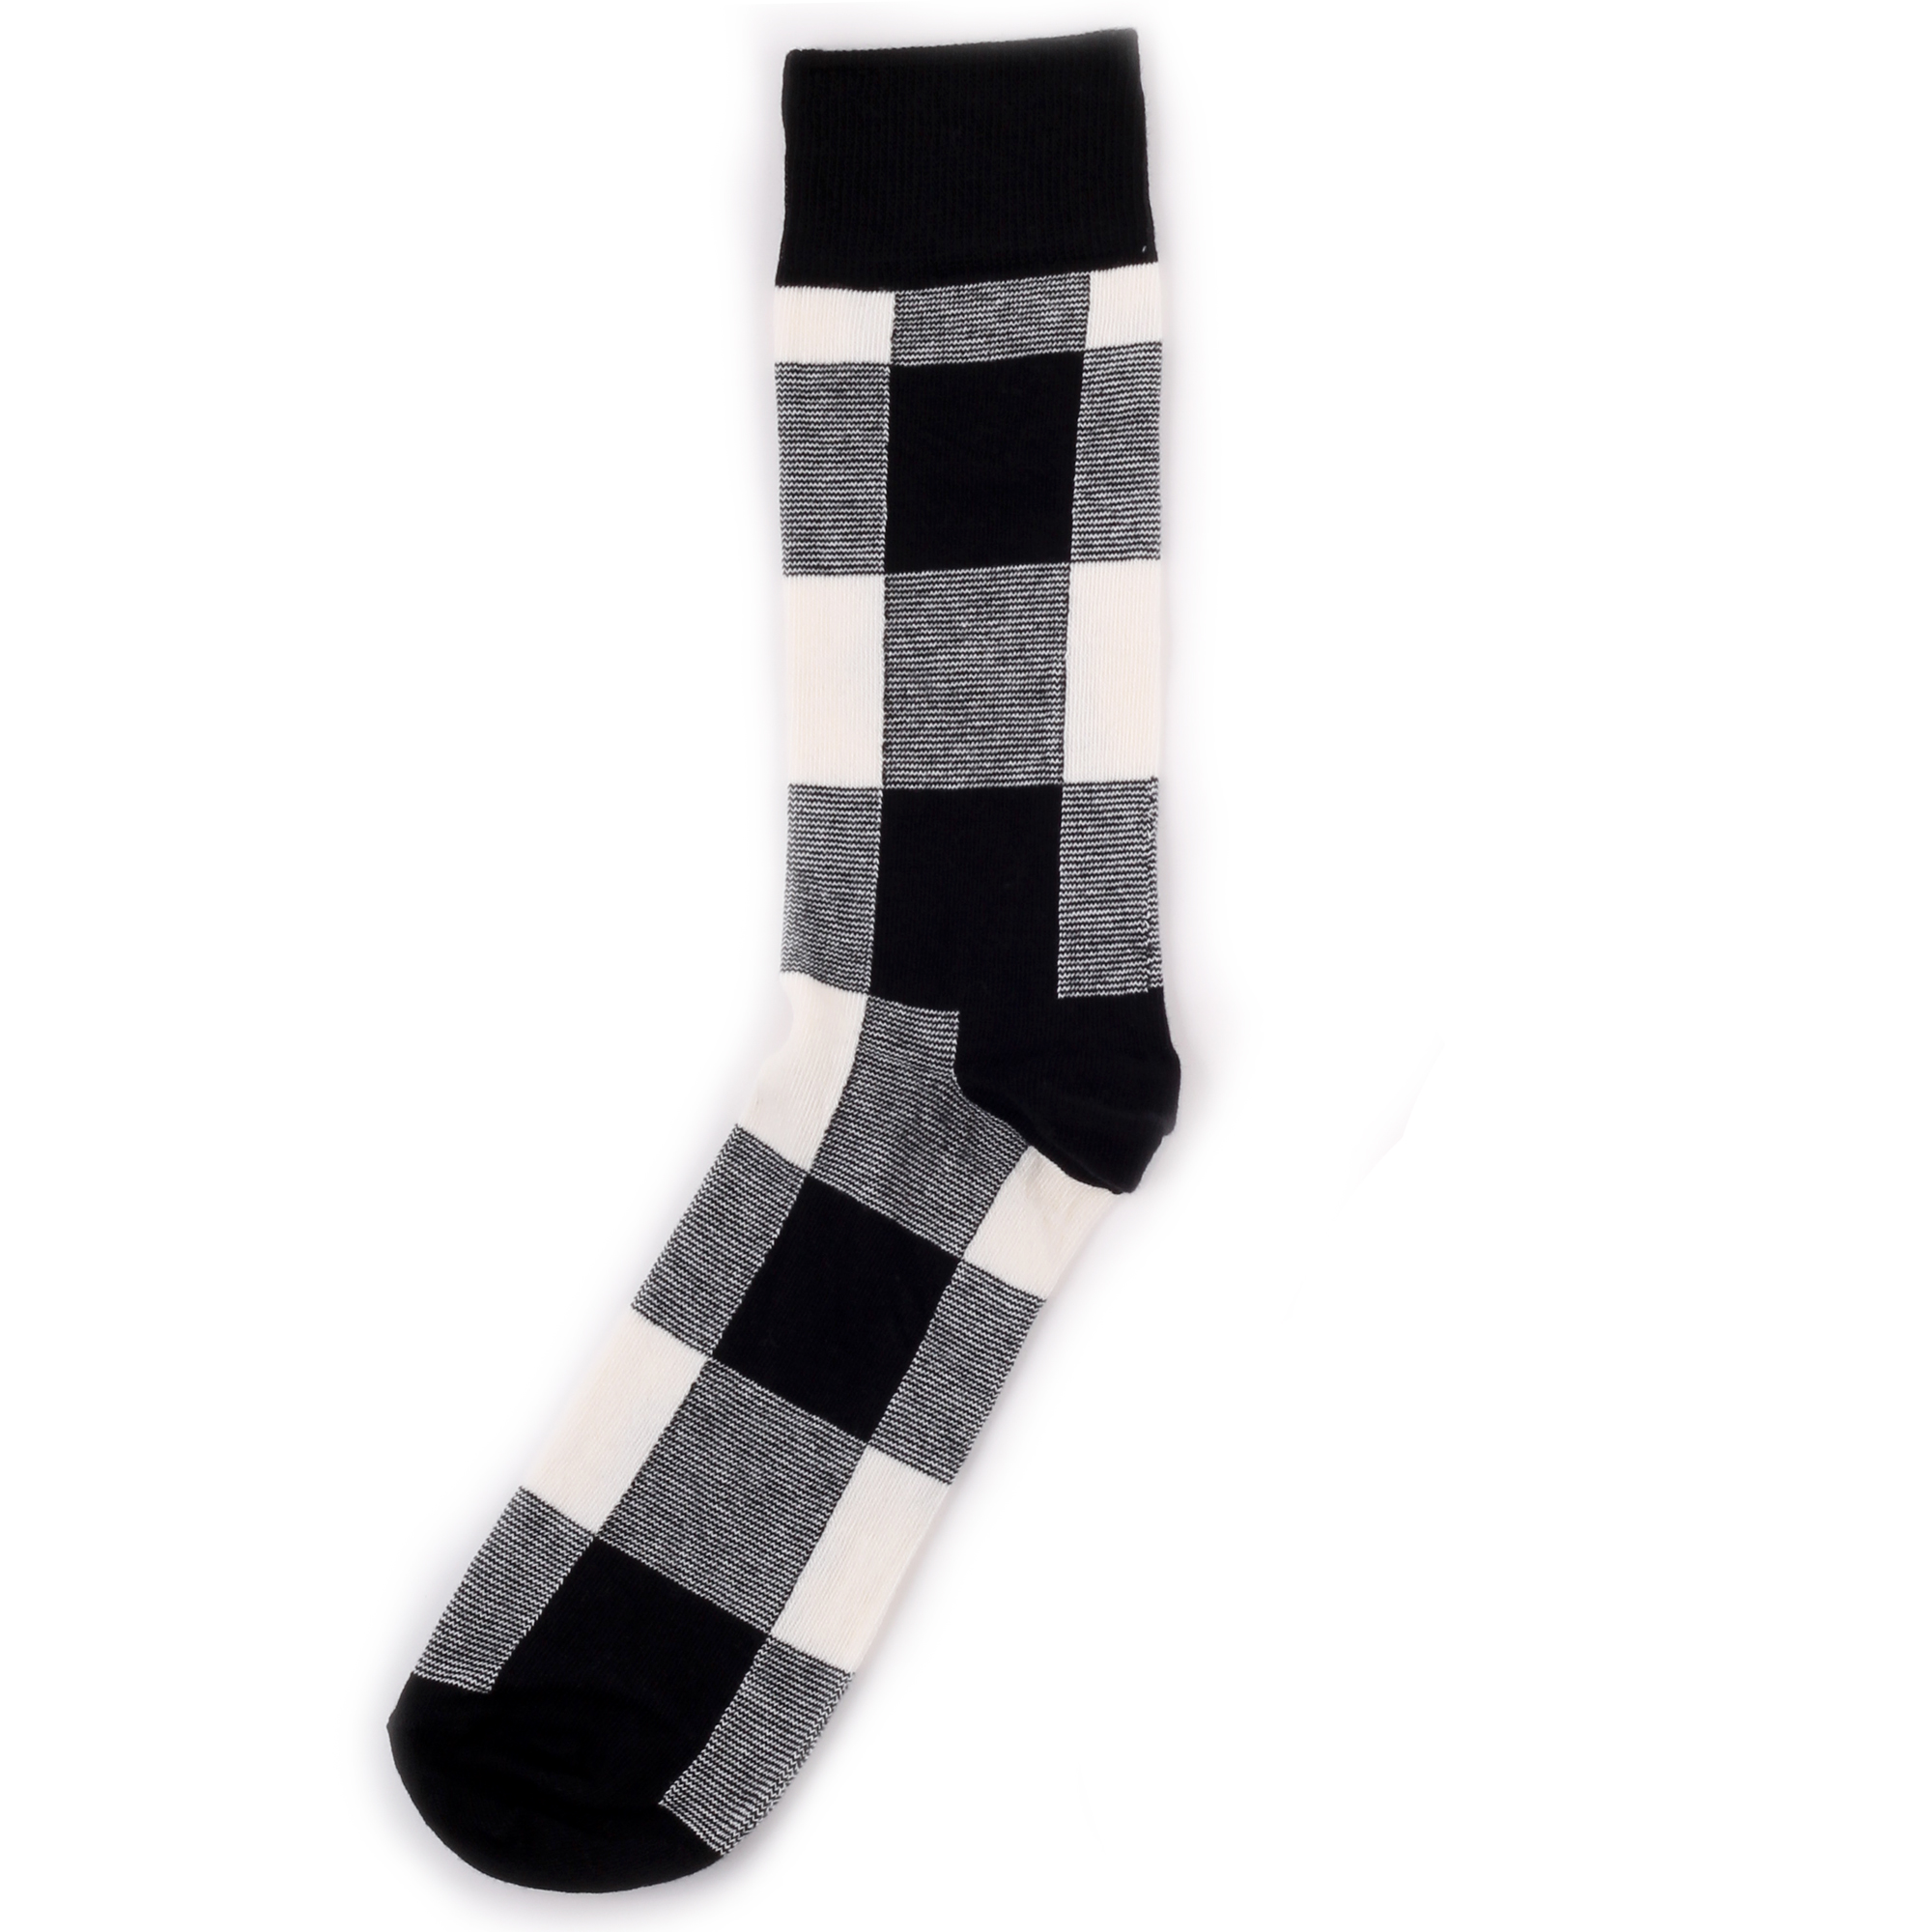 Носки унисекс Happy Socks Happy Socks Lumberjack - Black разноцветные 36-40